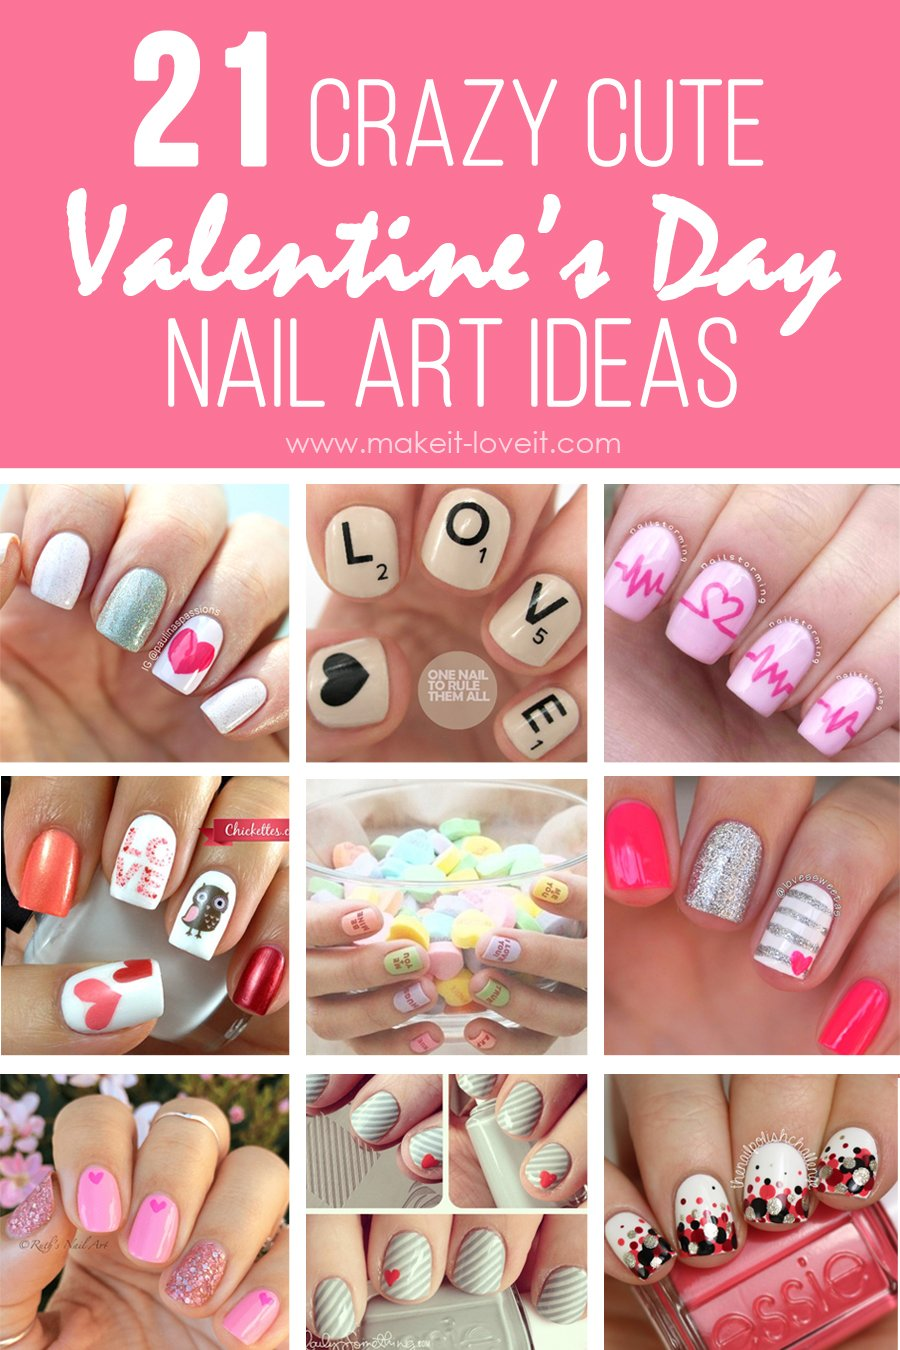 {21} Crazy Cute Valentine's Day NAIL ART IDEAS! | via Make It and - 21} Crazy Cute Valentine's Day NAIL ART IDEAS! Make It And Love It